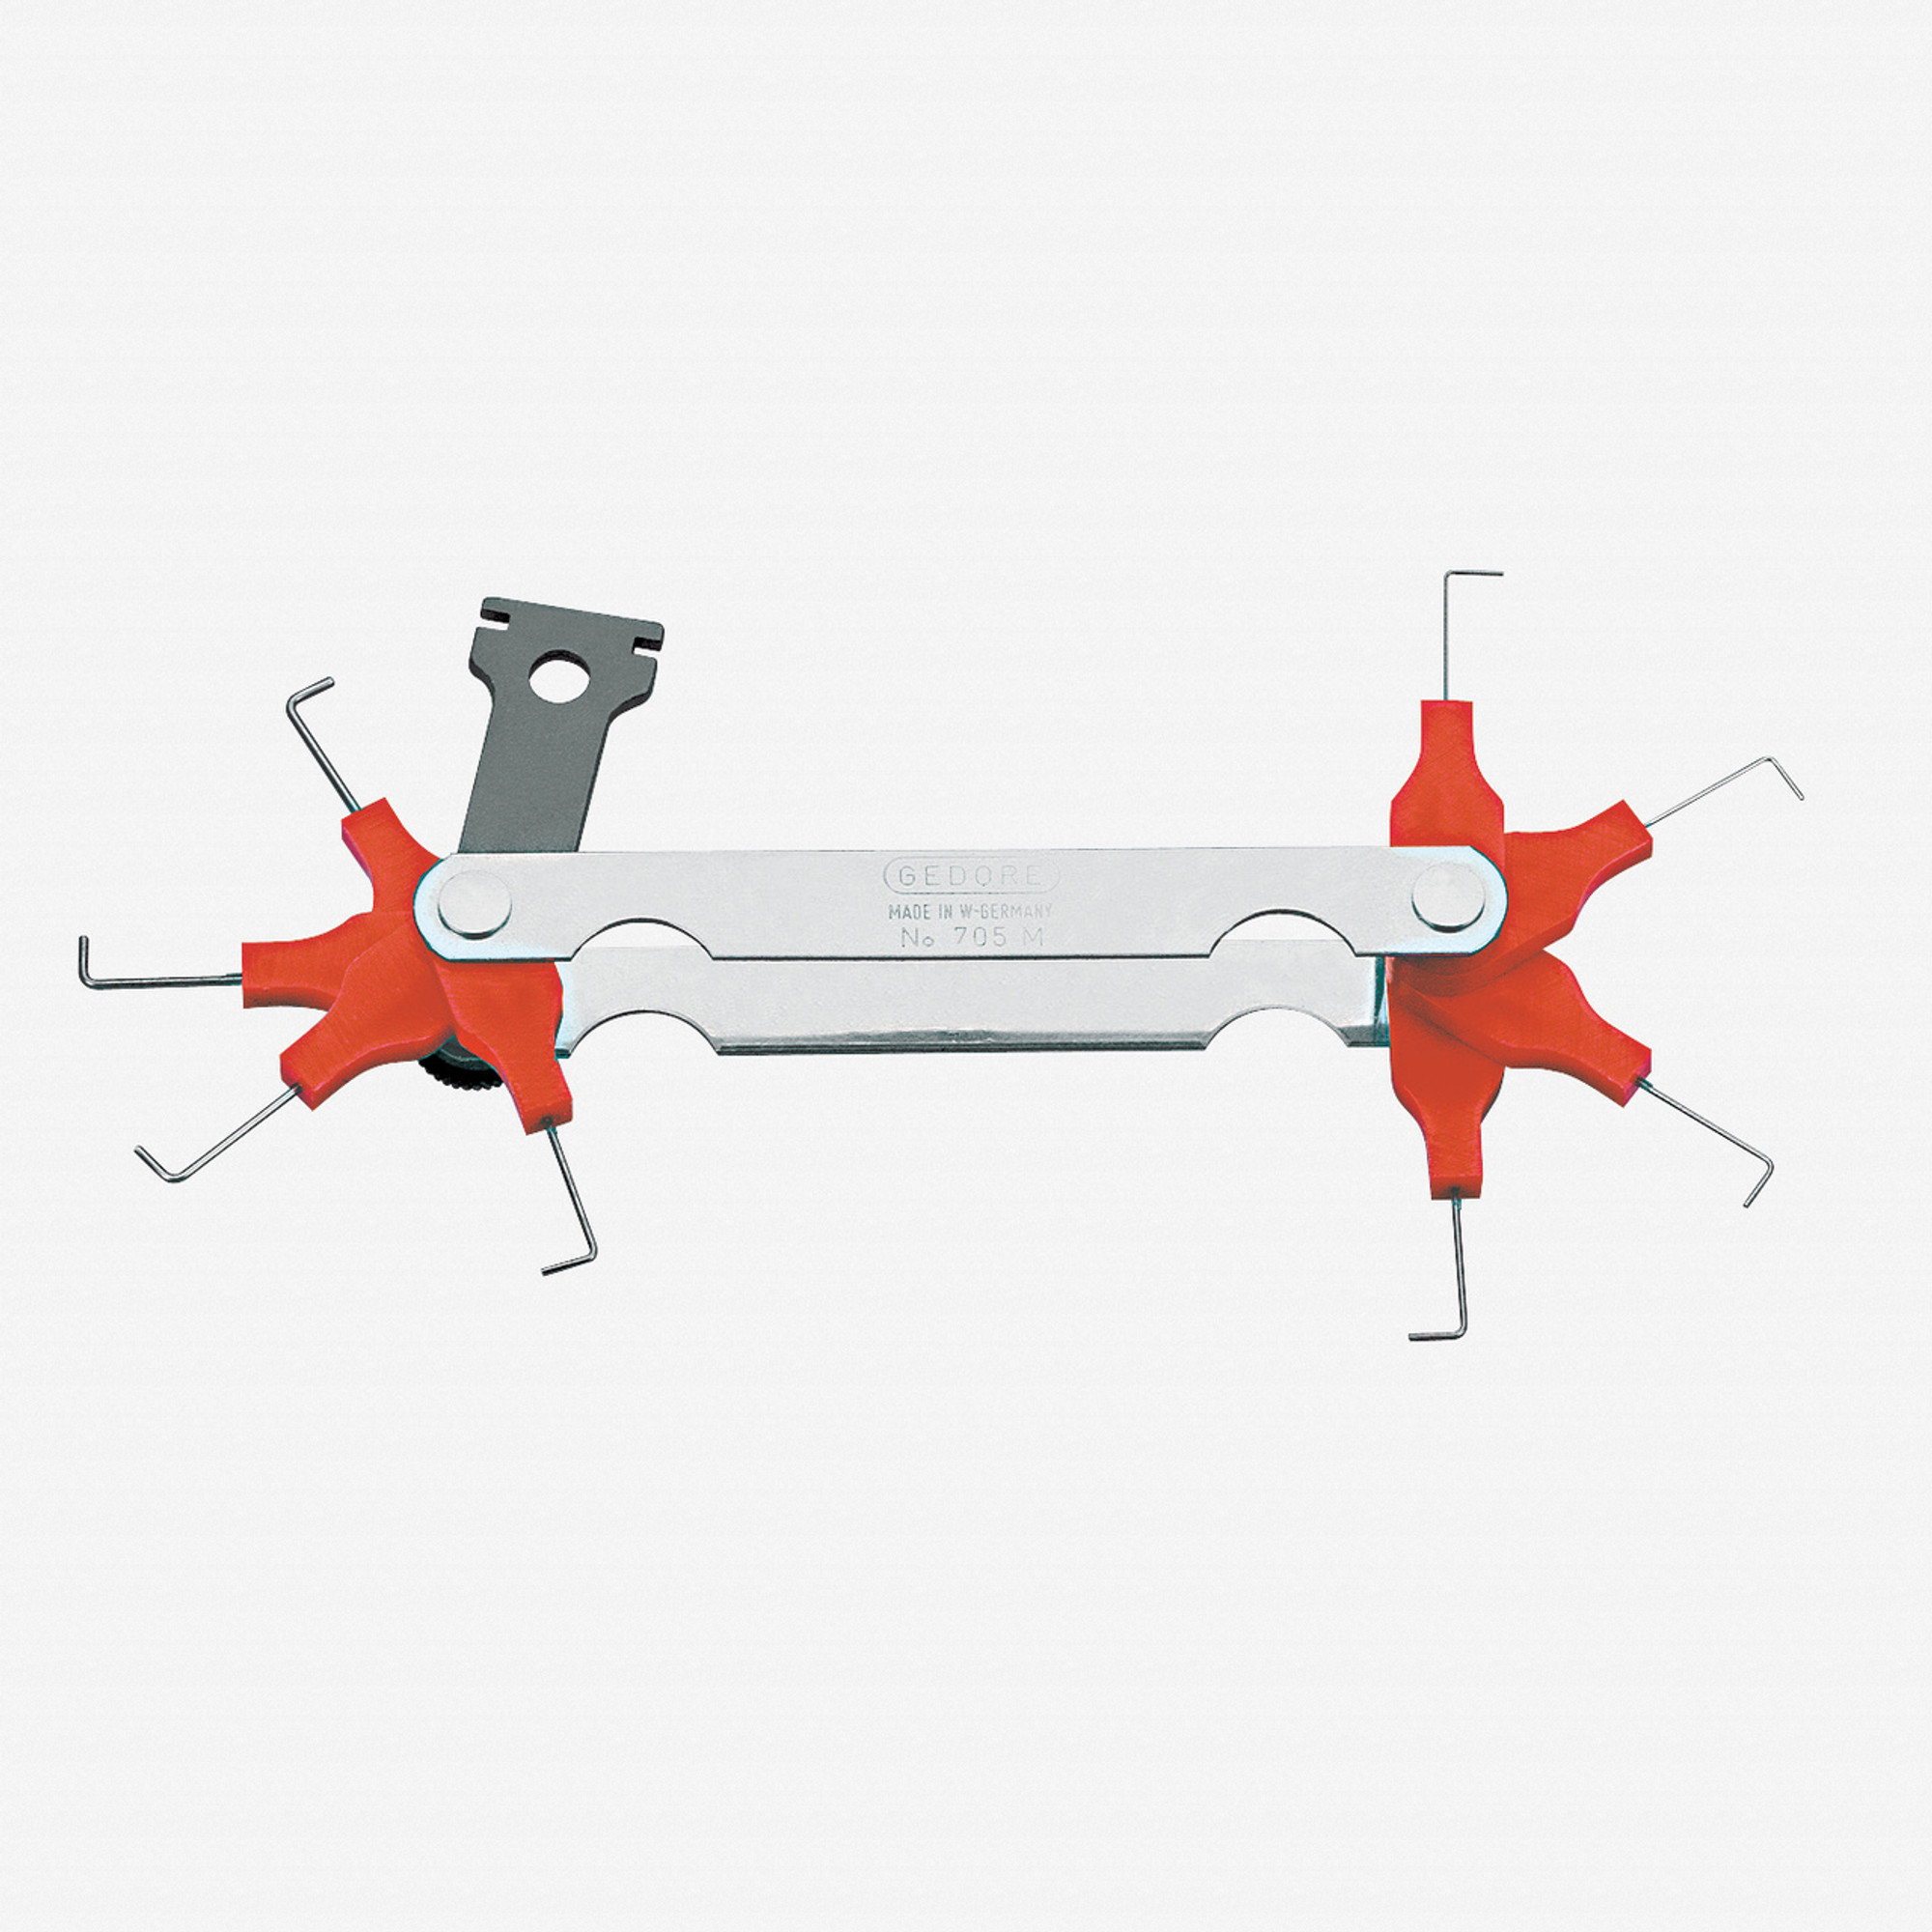 GEDORE 705 M Spark Plug Gauge 0,4-1,0 mm